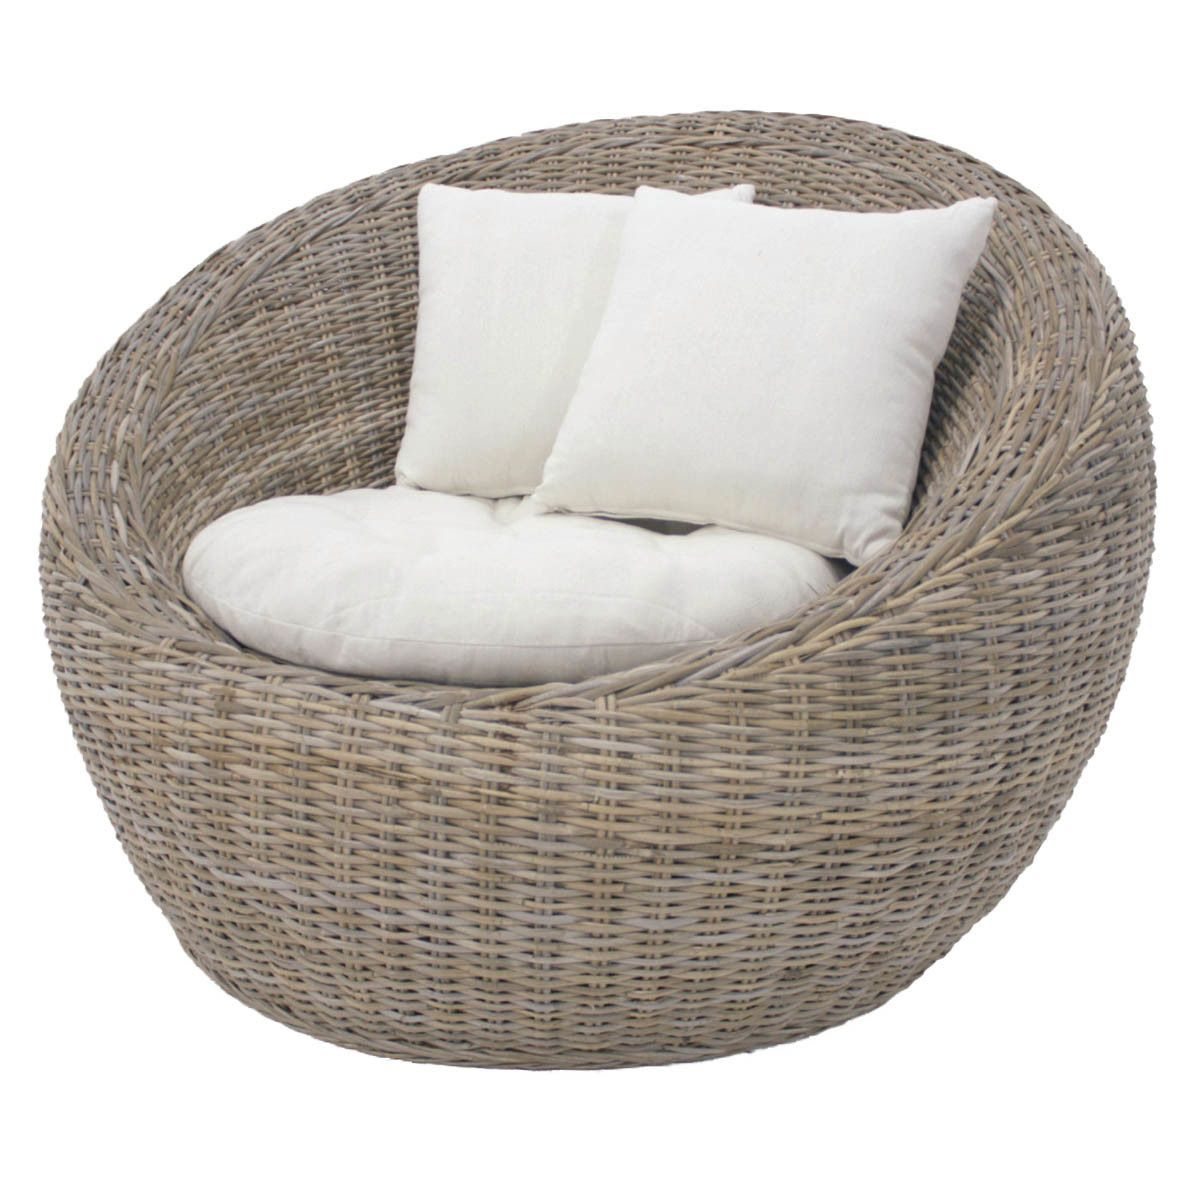 Carlos Kubu Tub Chair Temple Webster Wicker Patio Chairs Outdoor Wicker Furniture Outdoor Wicker Patio Furniture